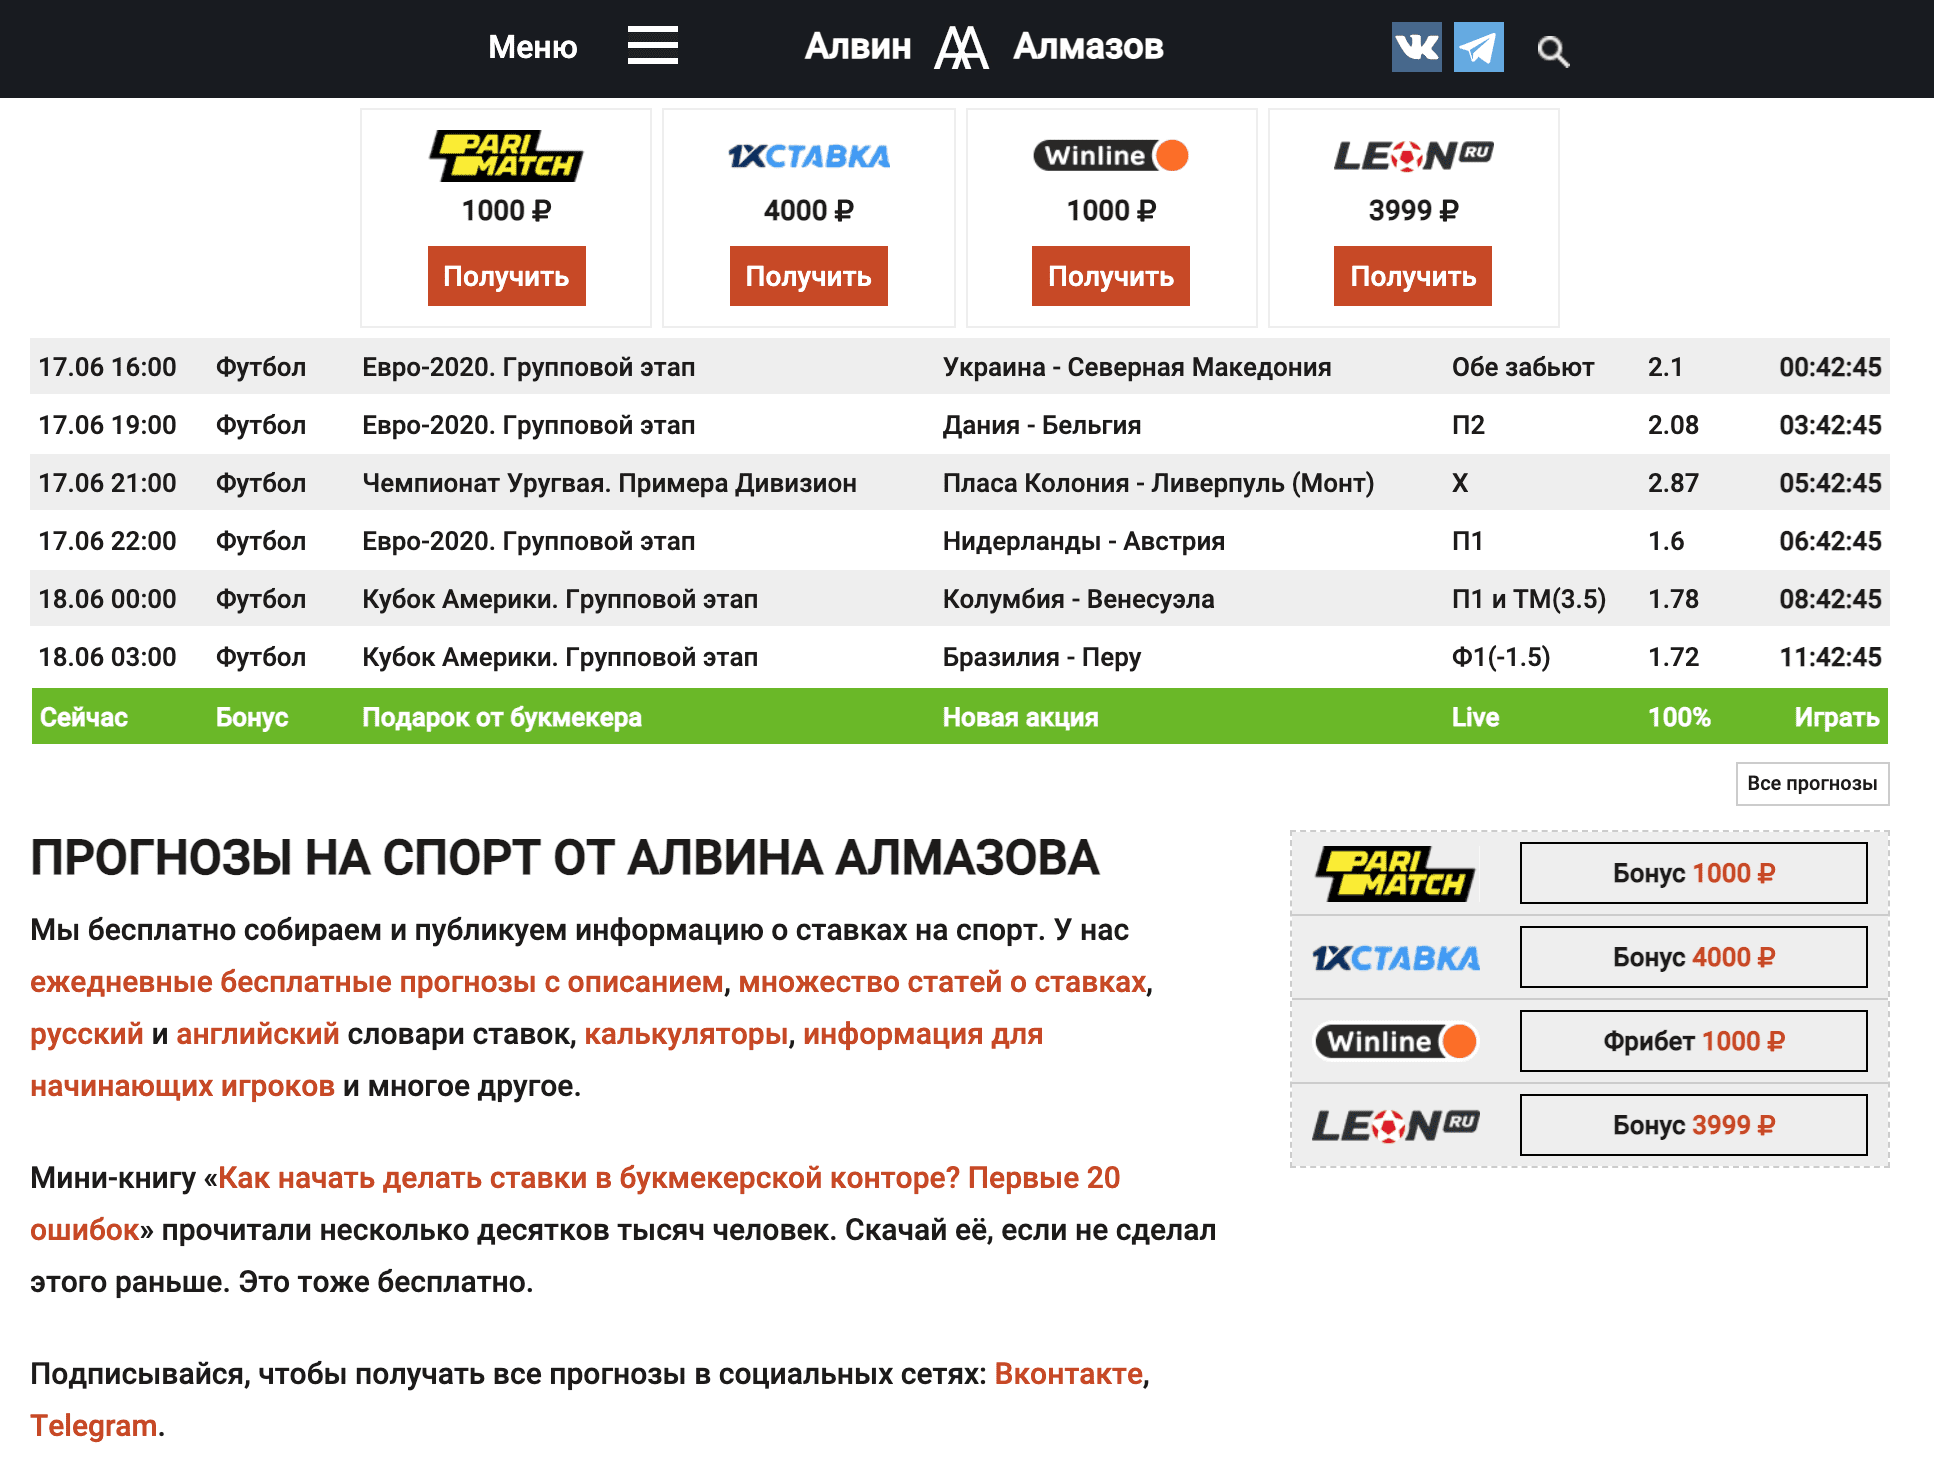 Главная сраница сайта Алвин Алмазов(Alvin Almazov ru)